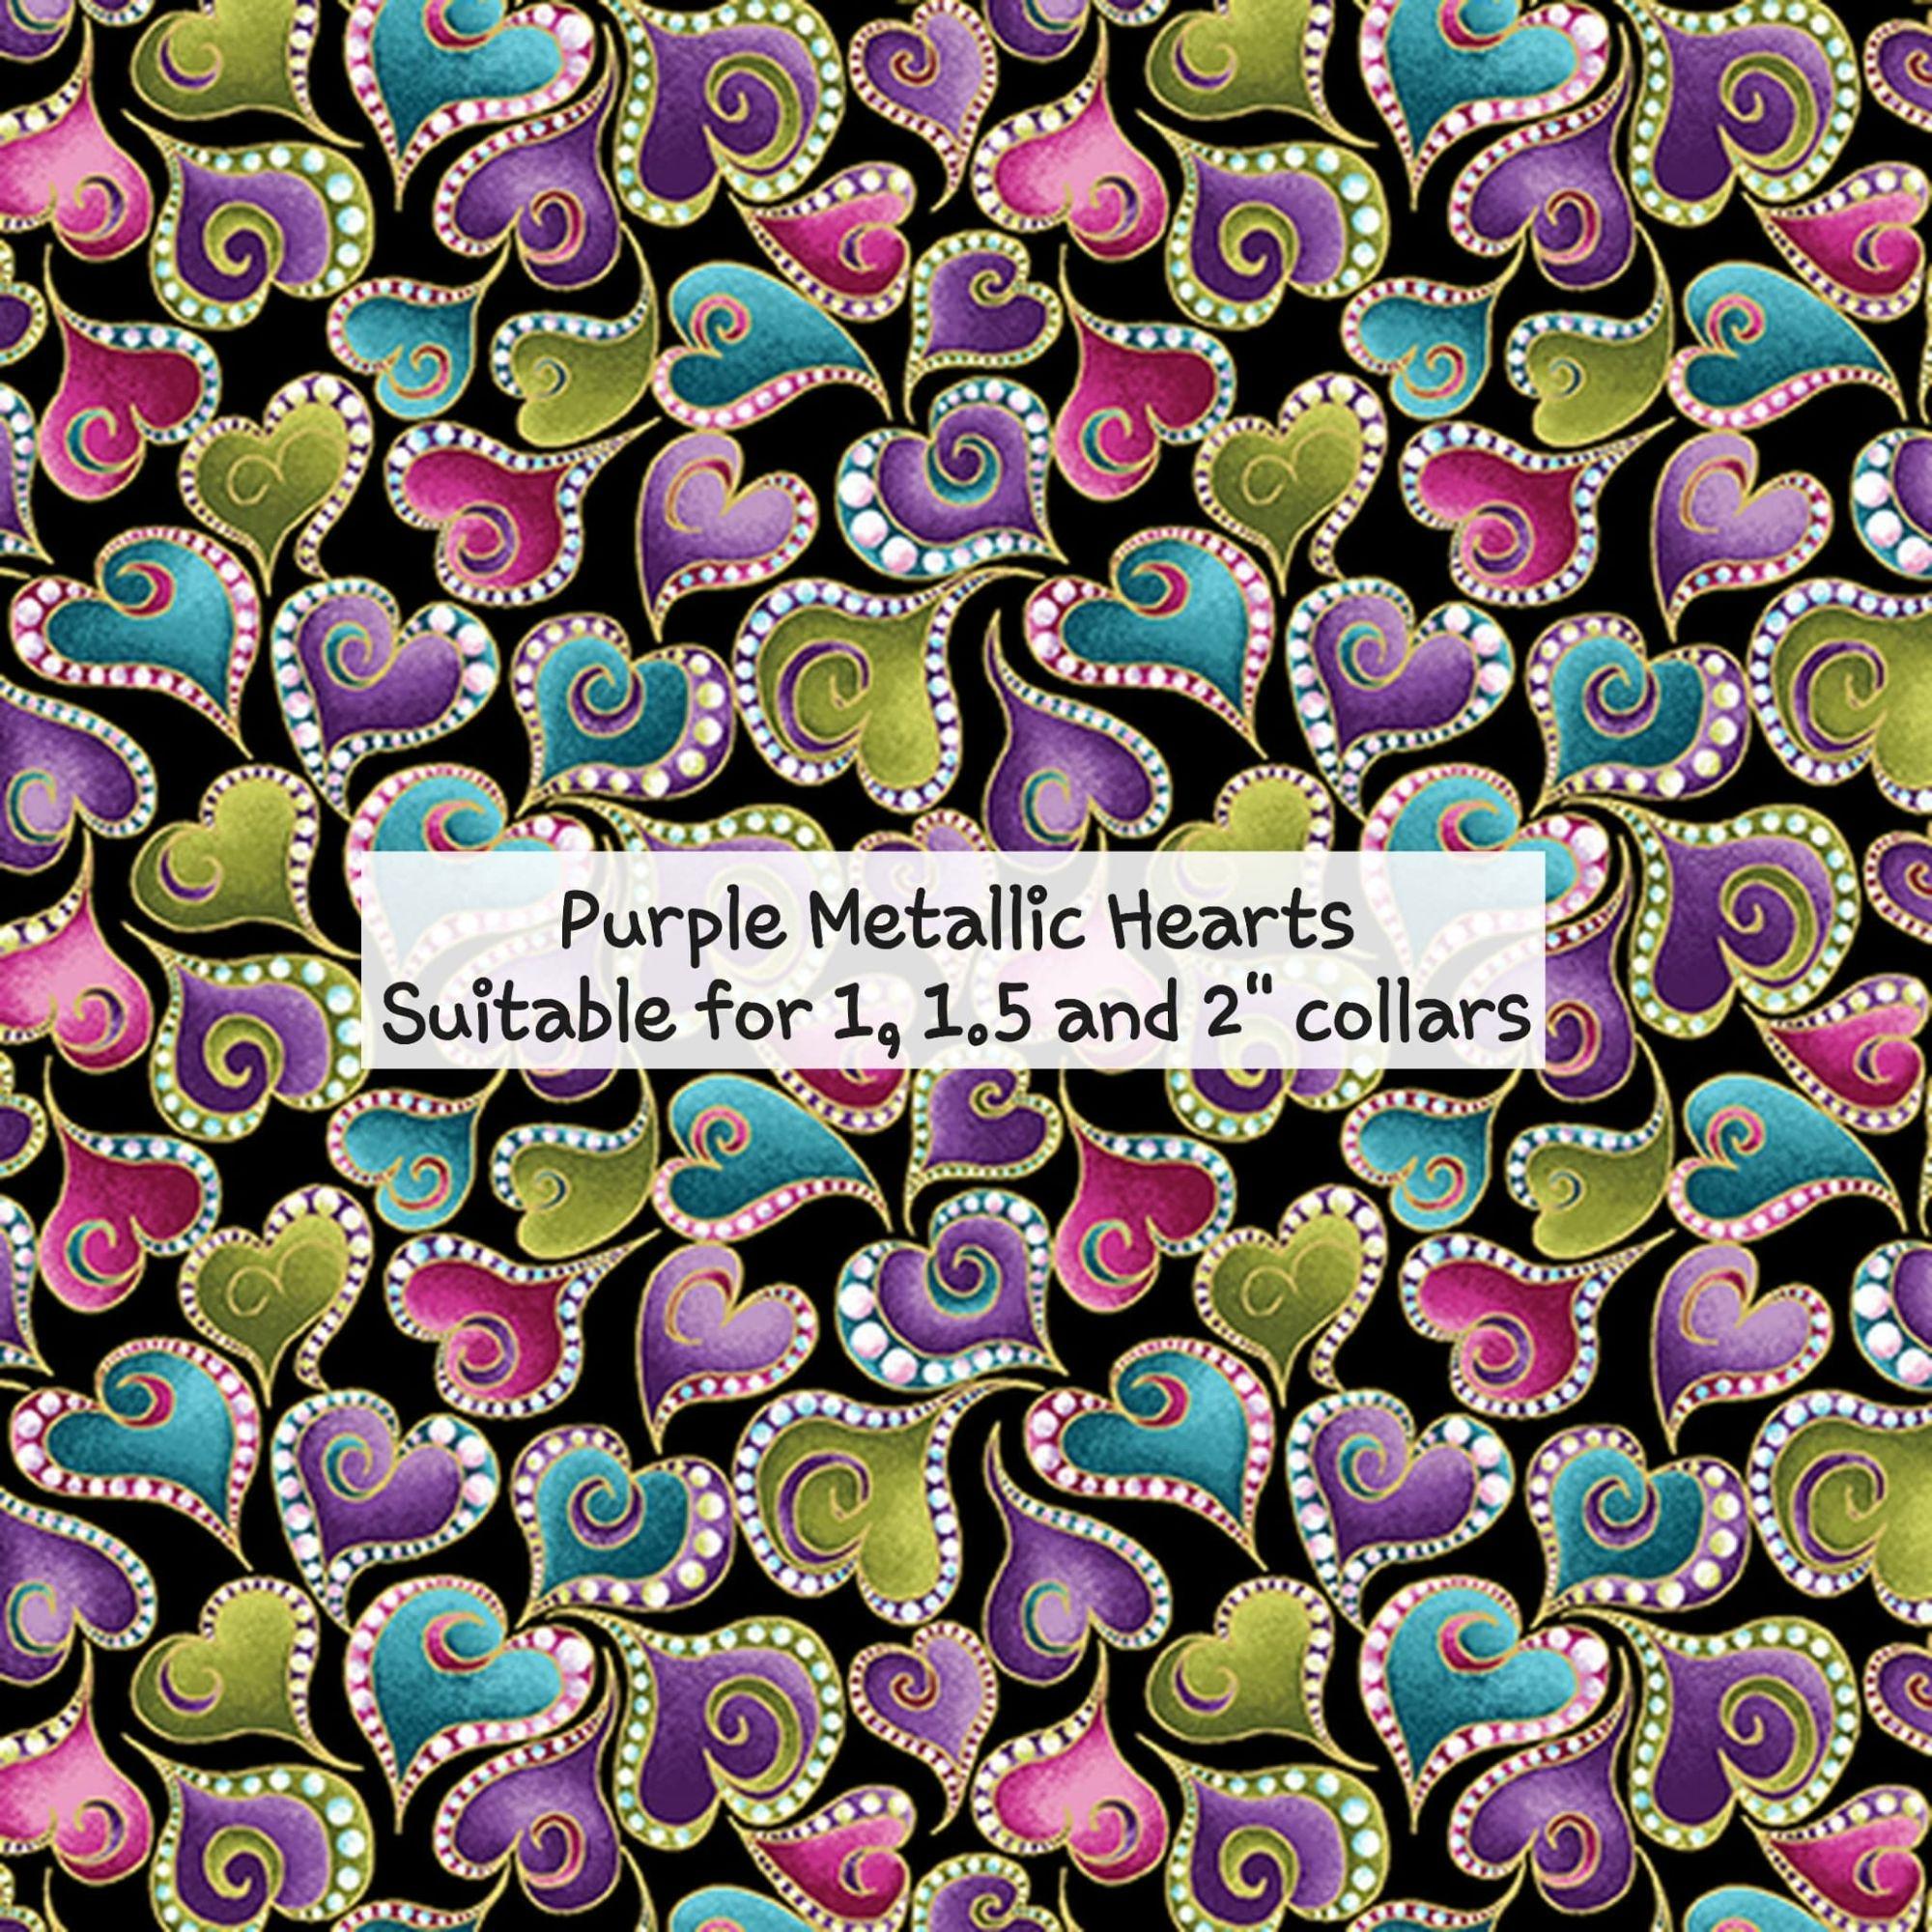 Purple Metallic Hearts